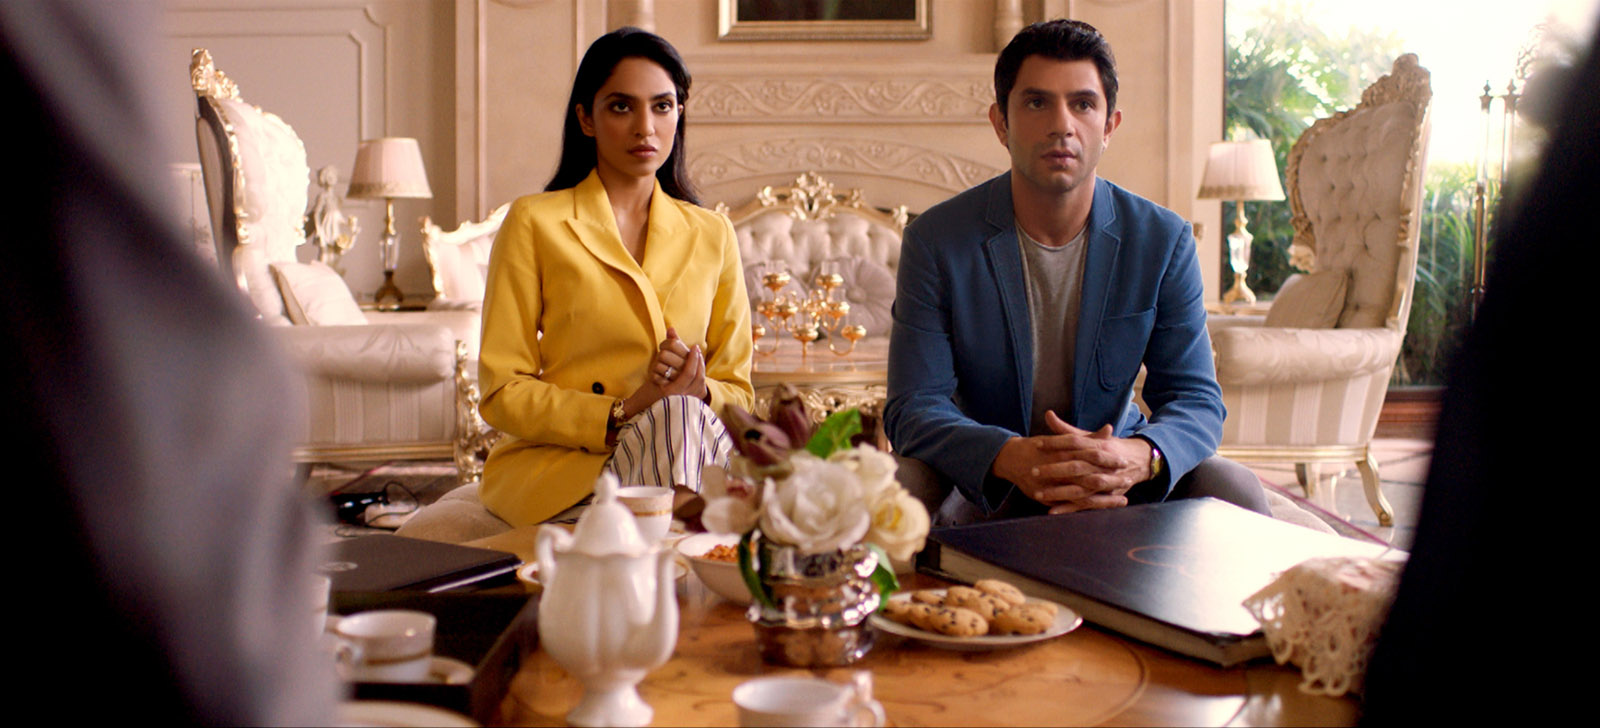 Sobhita Dhulipala as Tara Khanna and Arjun Mathur as Karan Mehra in Made in Heaven